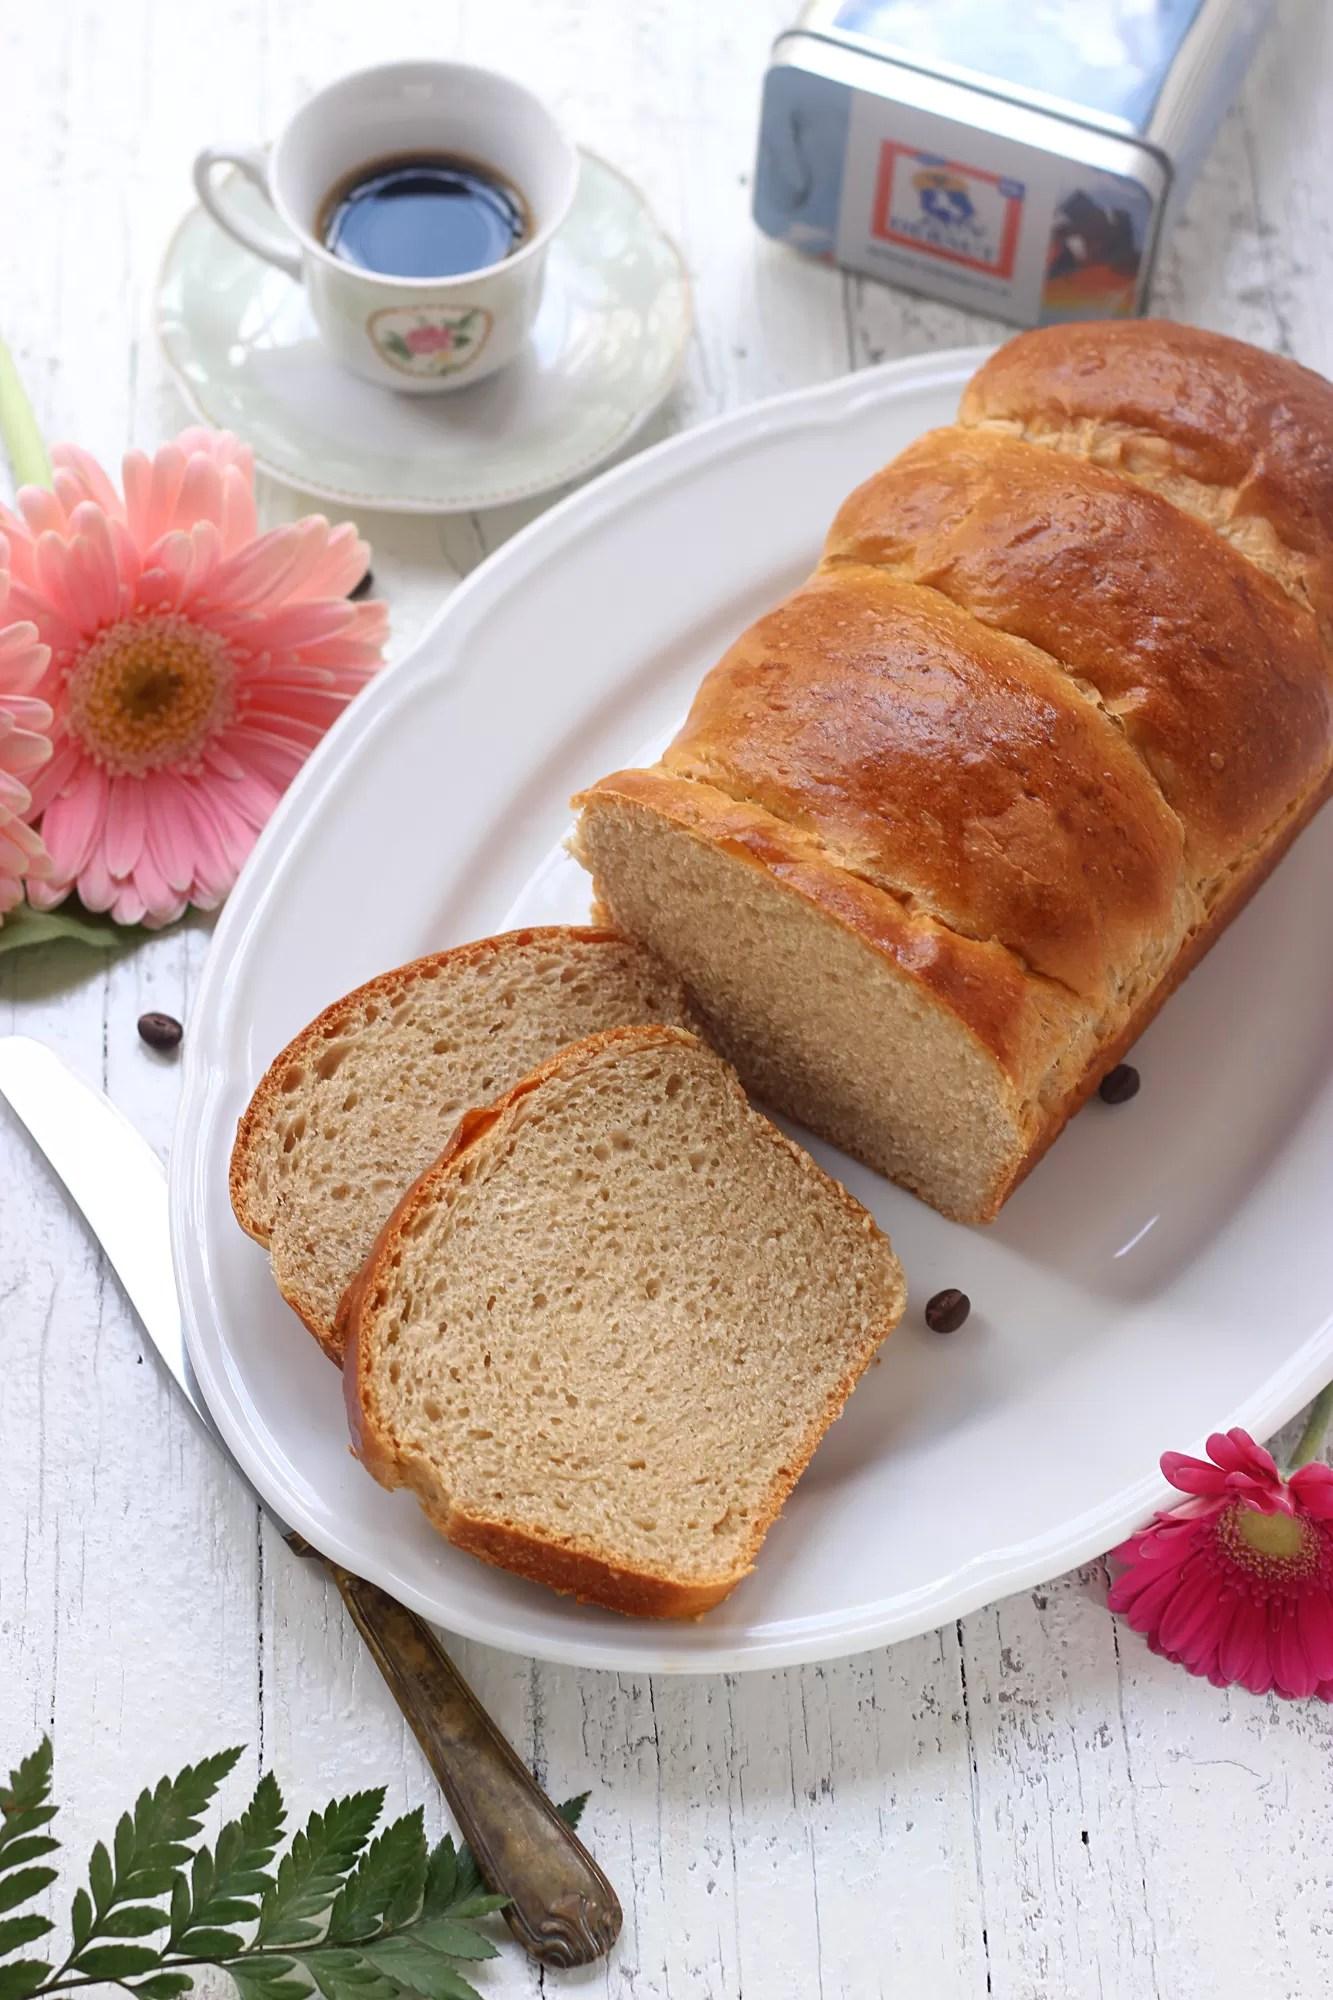 Ricetta del pane dolce al caffè